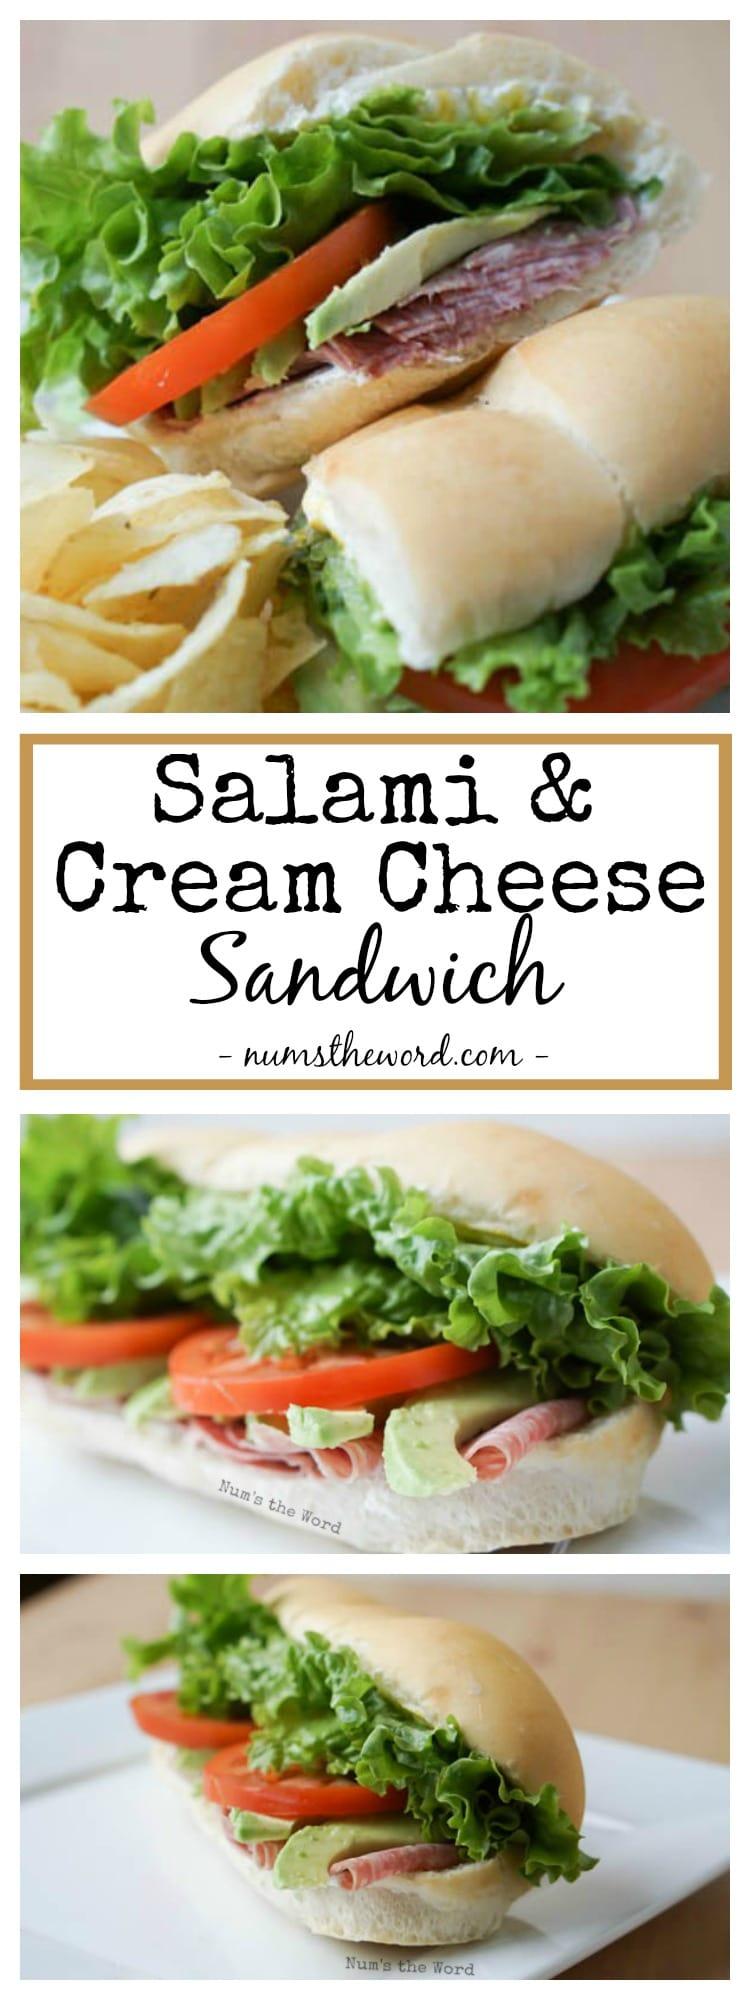 Salami & Cream Cheese Sandwich